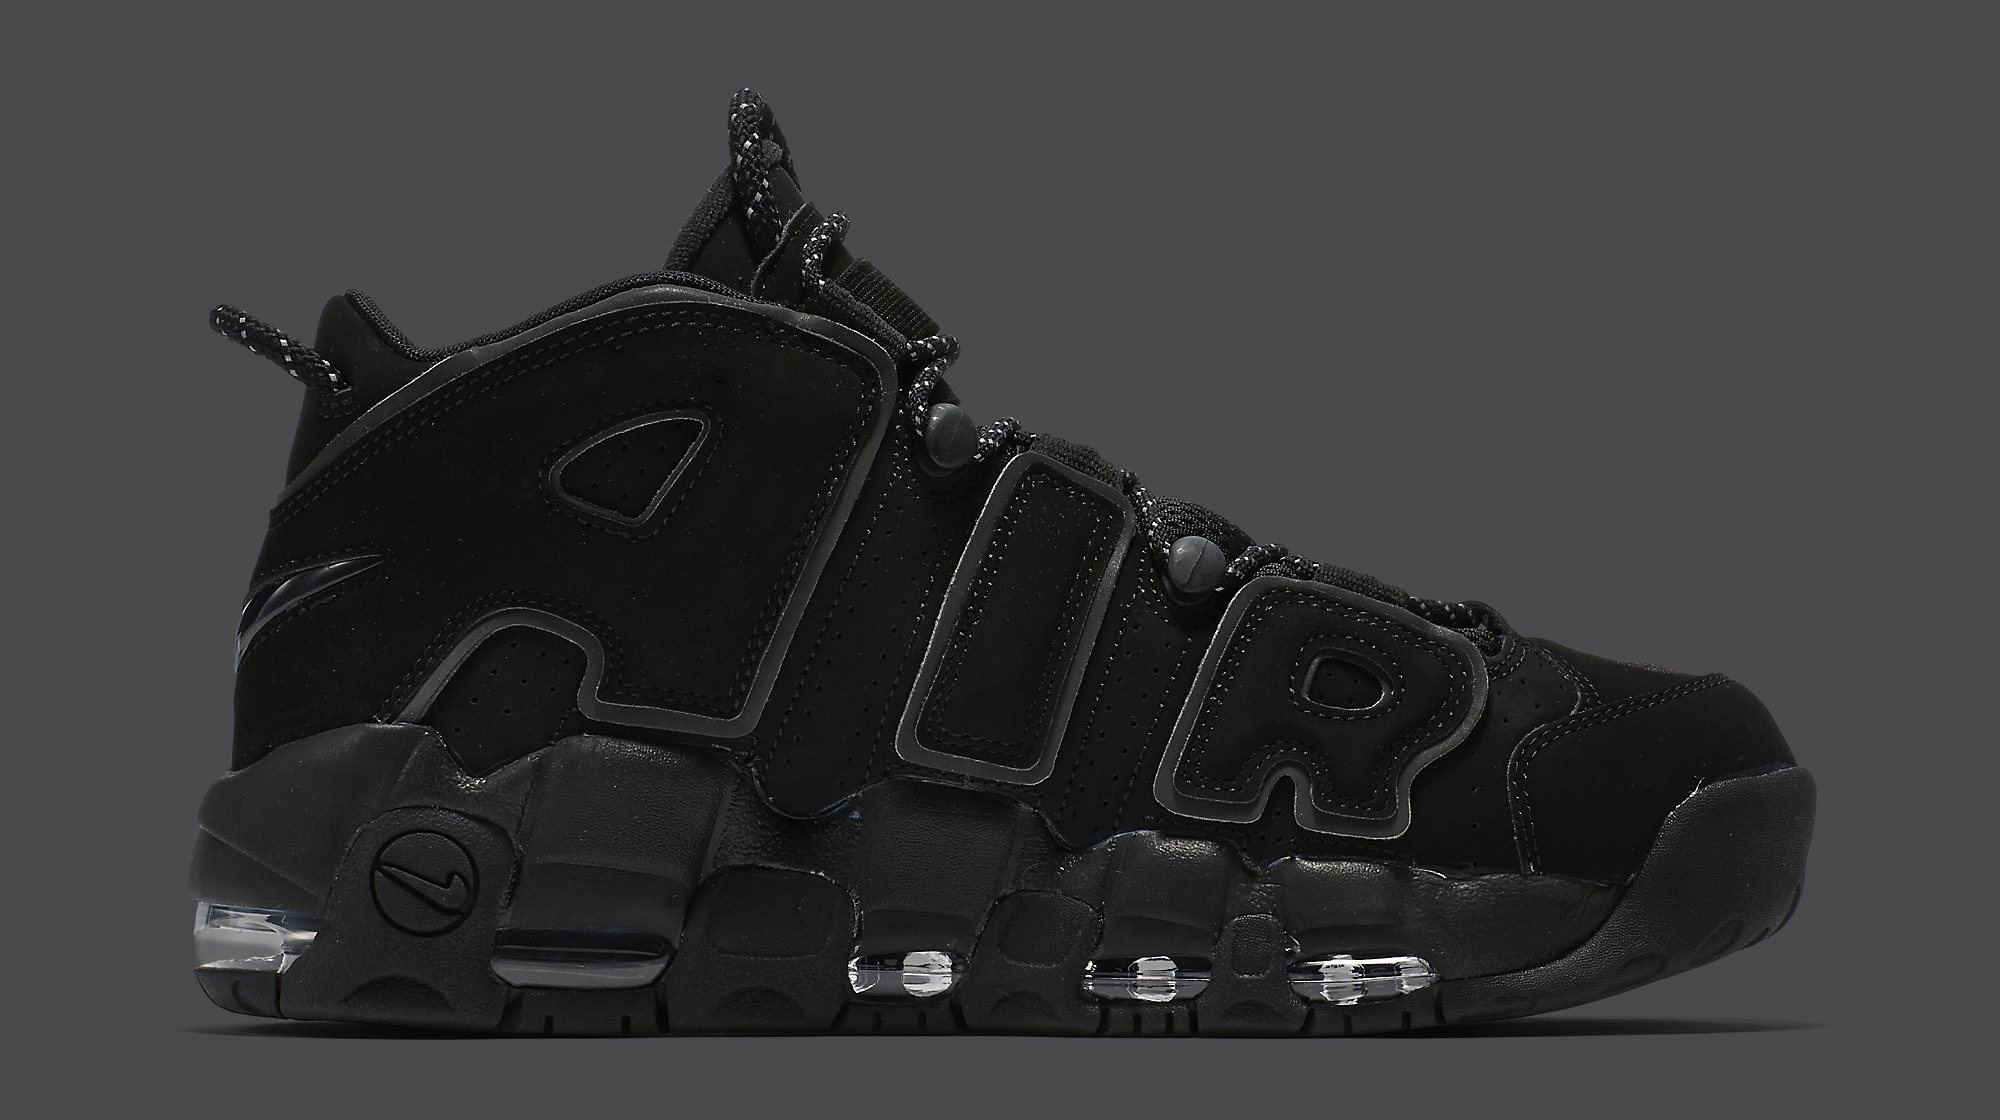 Nike Air More Uptempo Black Reflective 414962-004 Medial